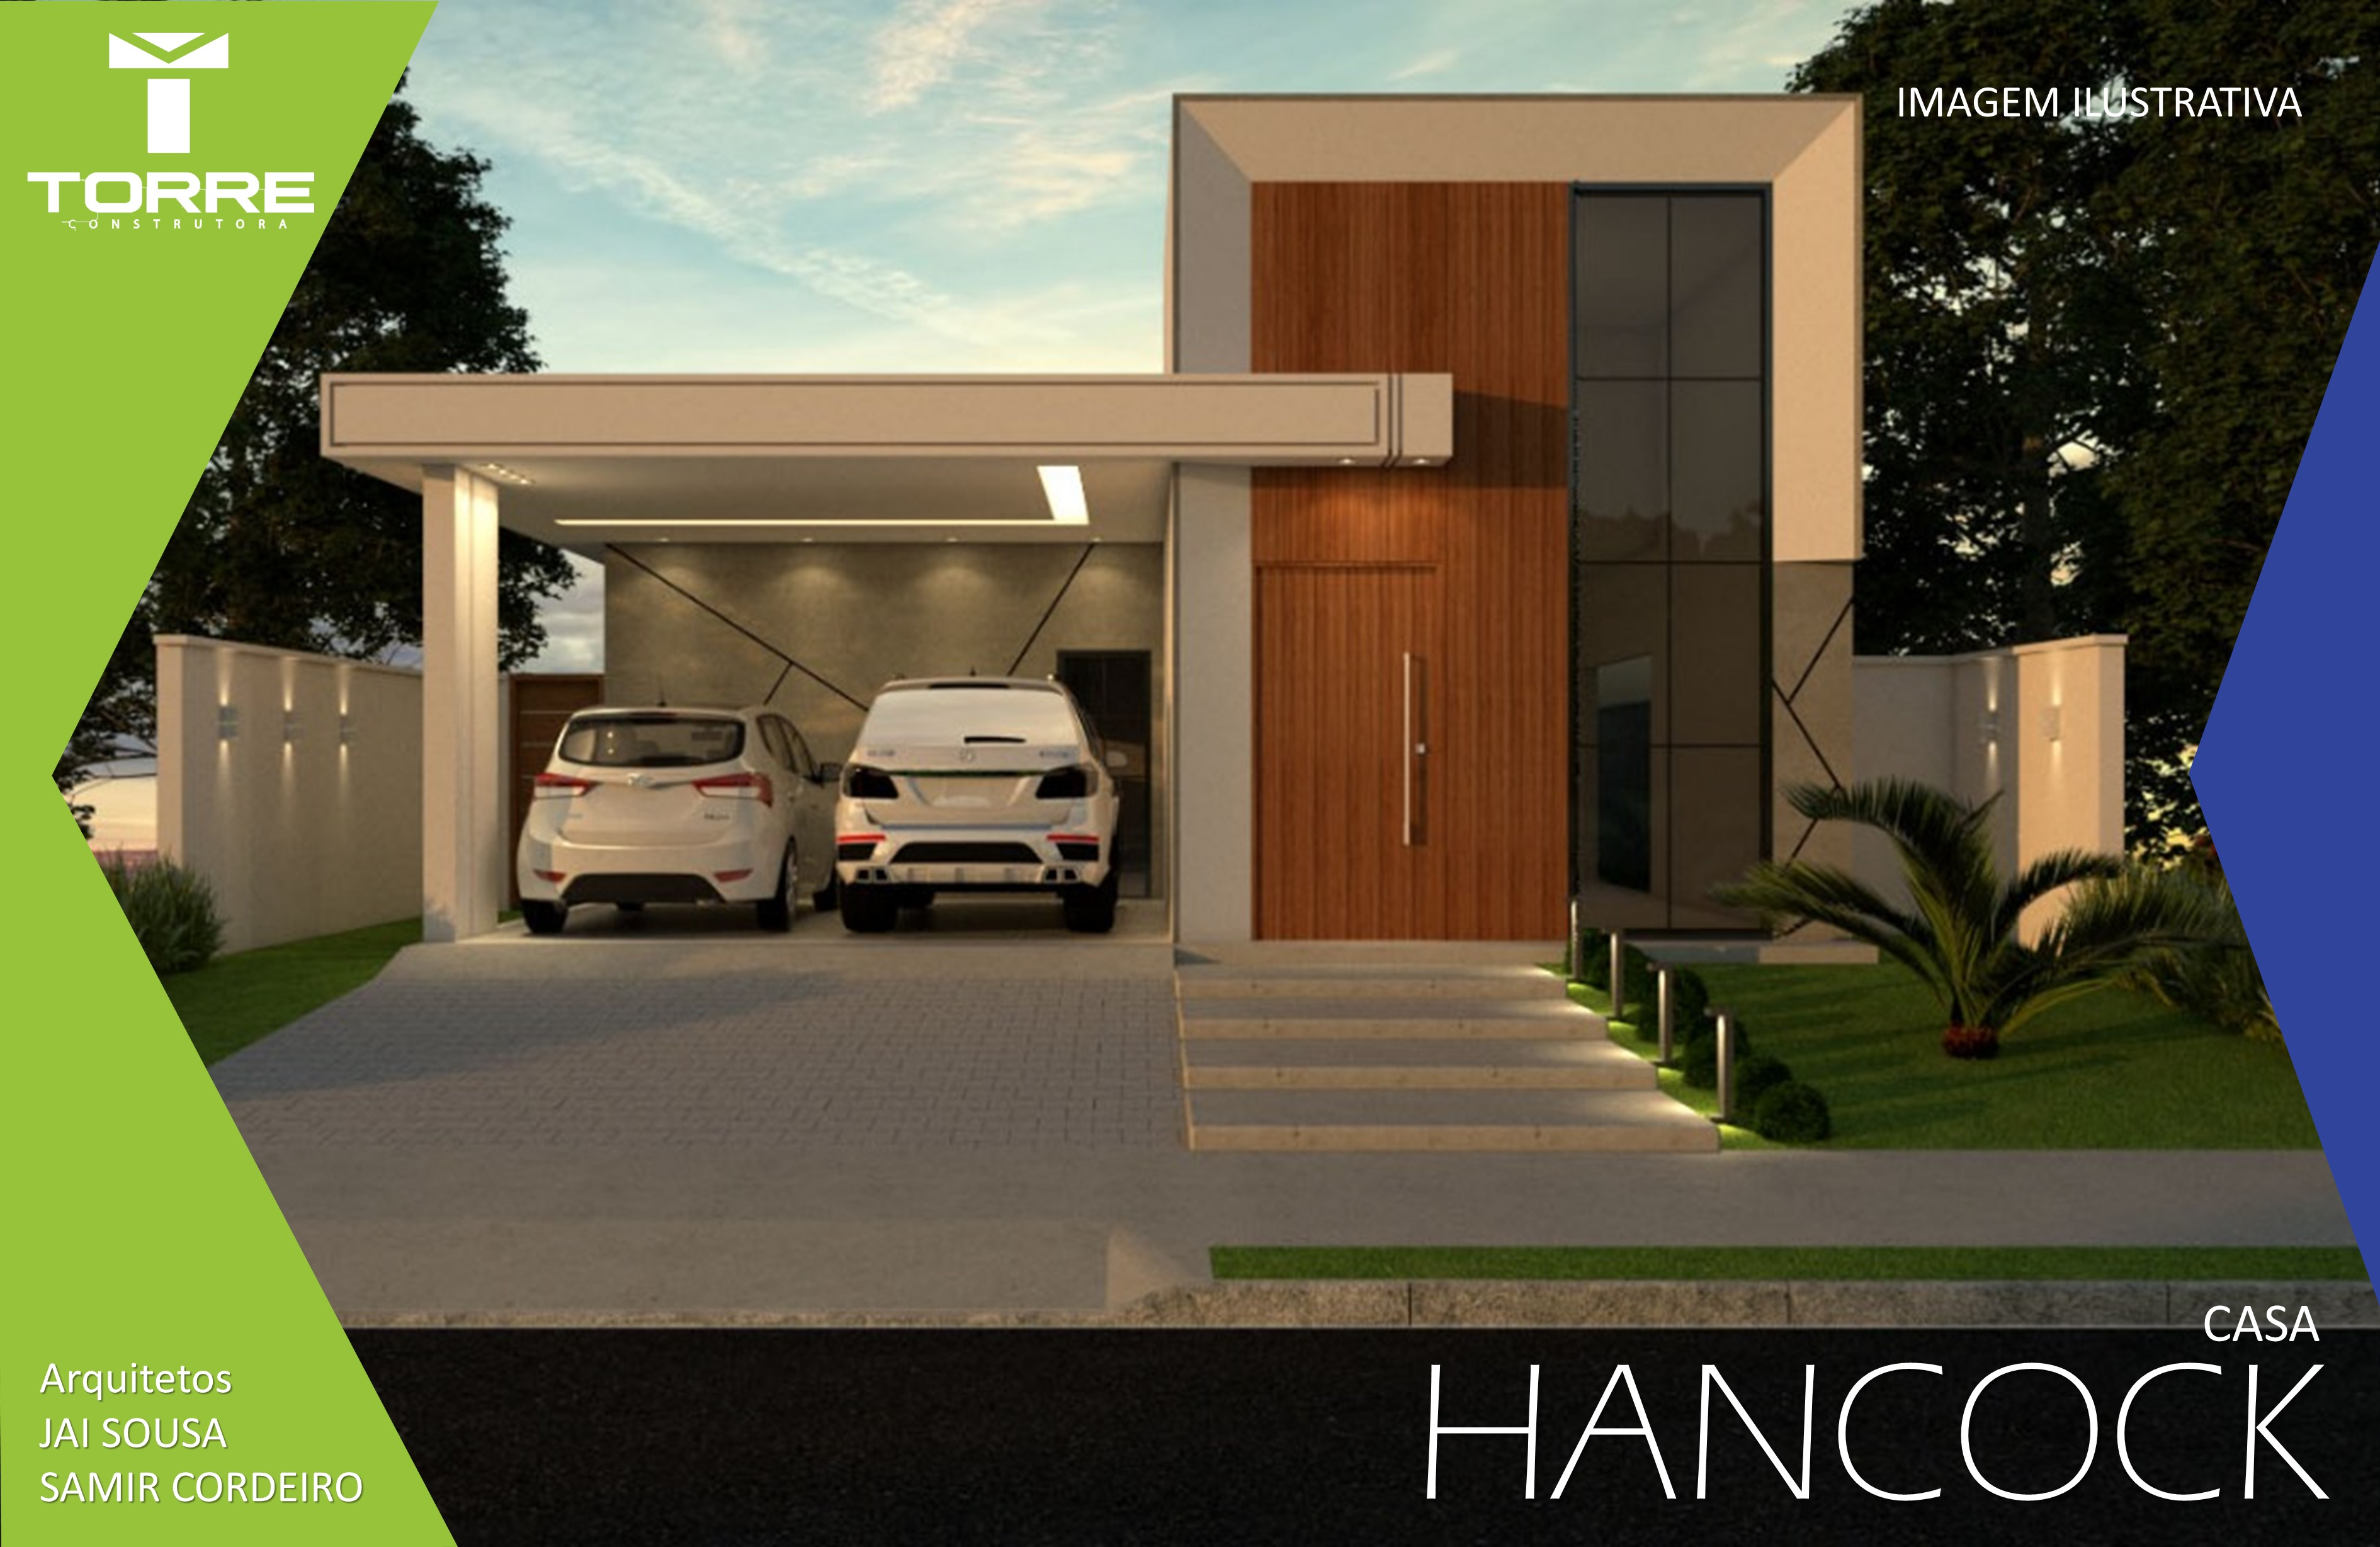 Casa Hancock